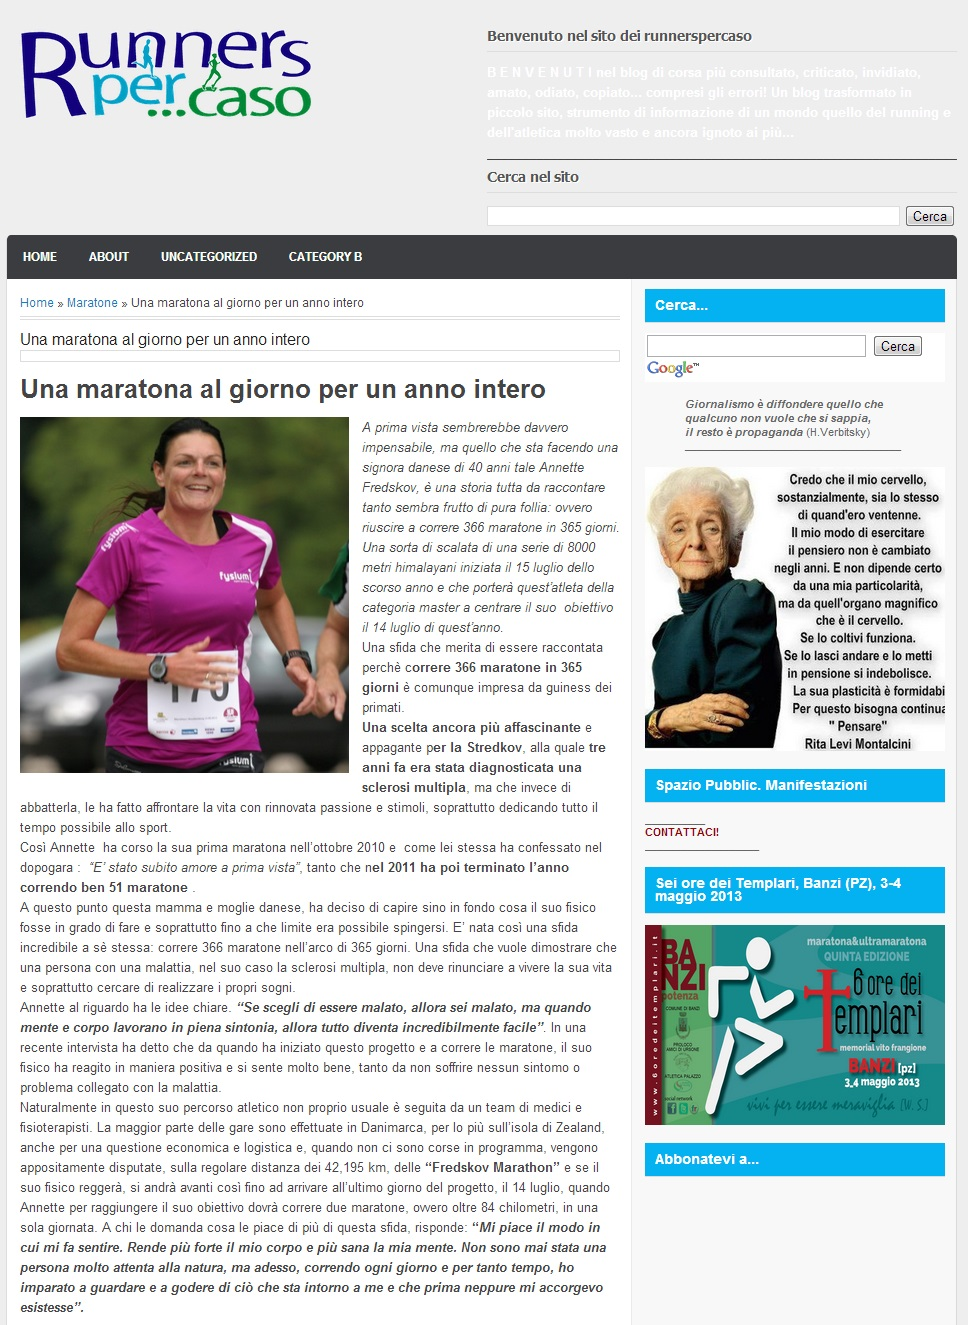 denisequintieri.blogspot.dk 2013.03.05